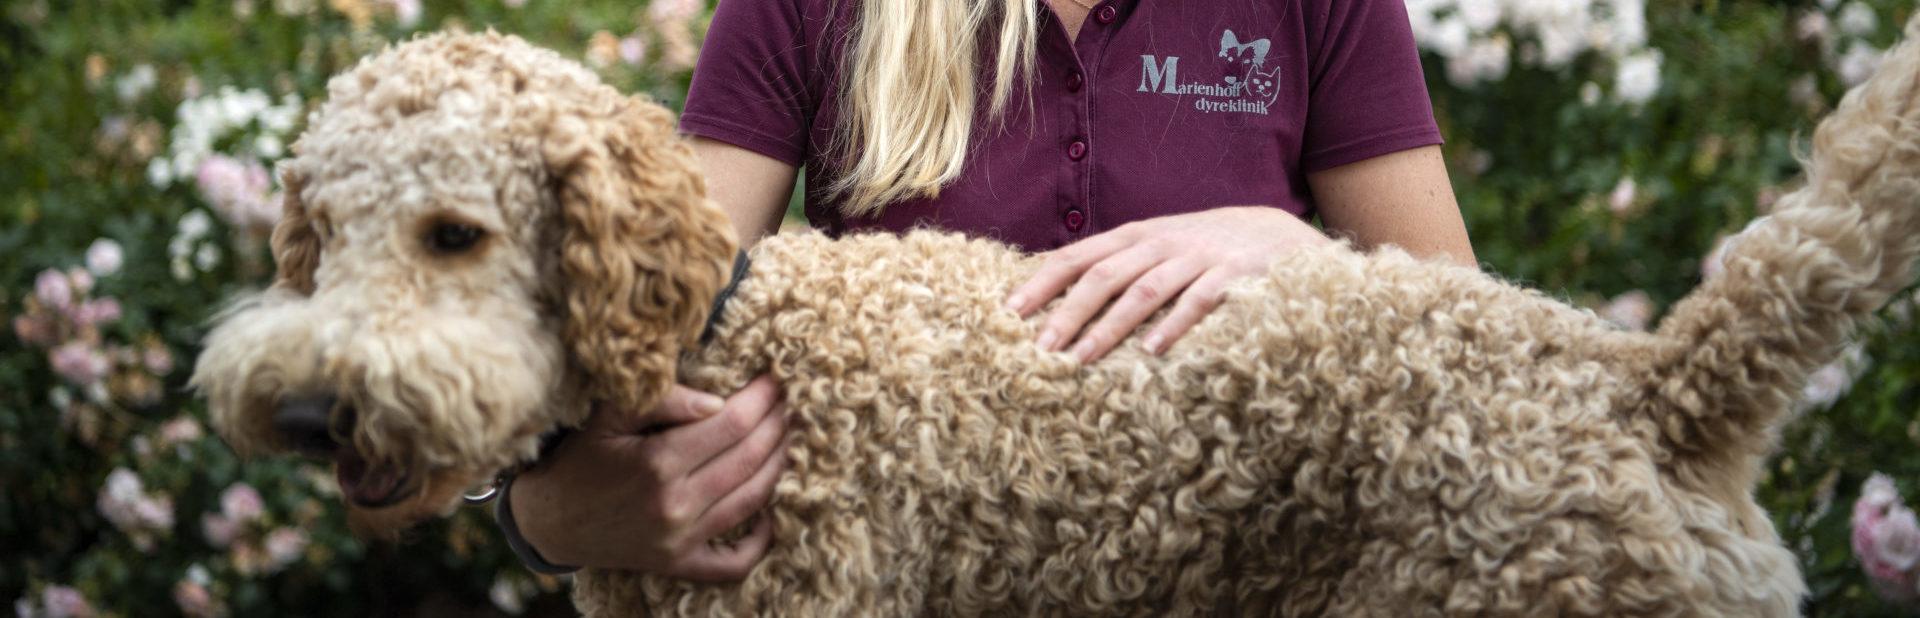 adfaerdssamtale hund kat marienhoff dyreklinik1 e1602759893791